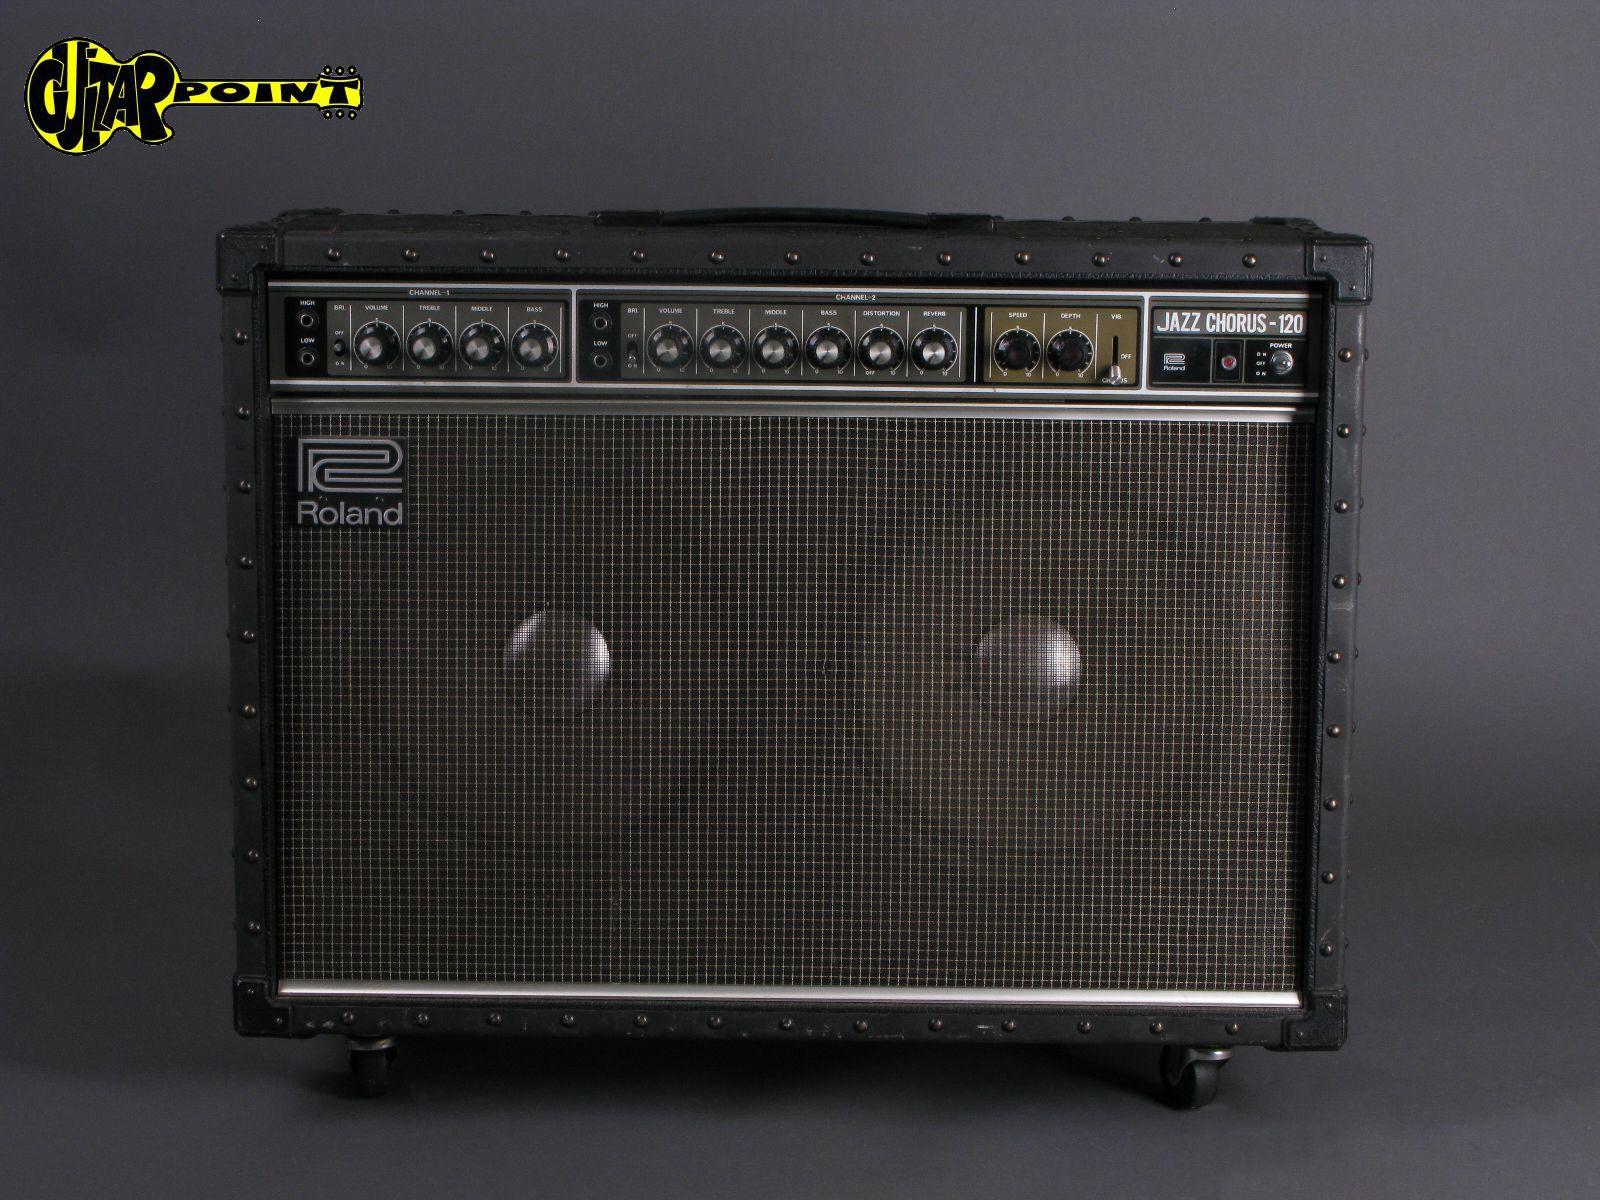 roland jazz chorus jc 120 stereo 1978 amp for sale guitarpoint. Black Bedroom Furniture Sets. Home Design Ideas